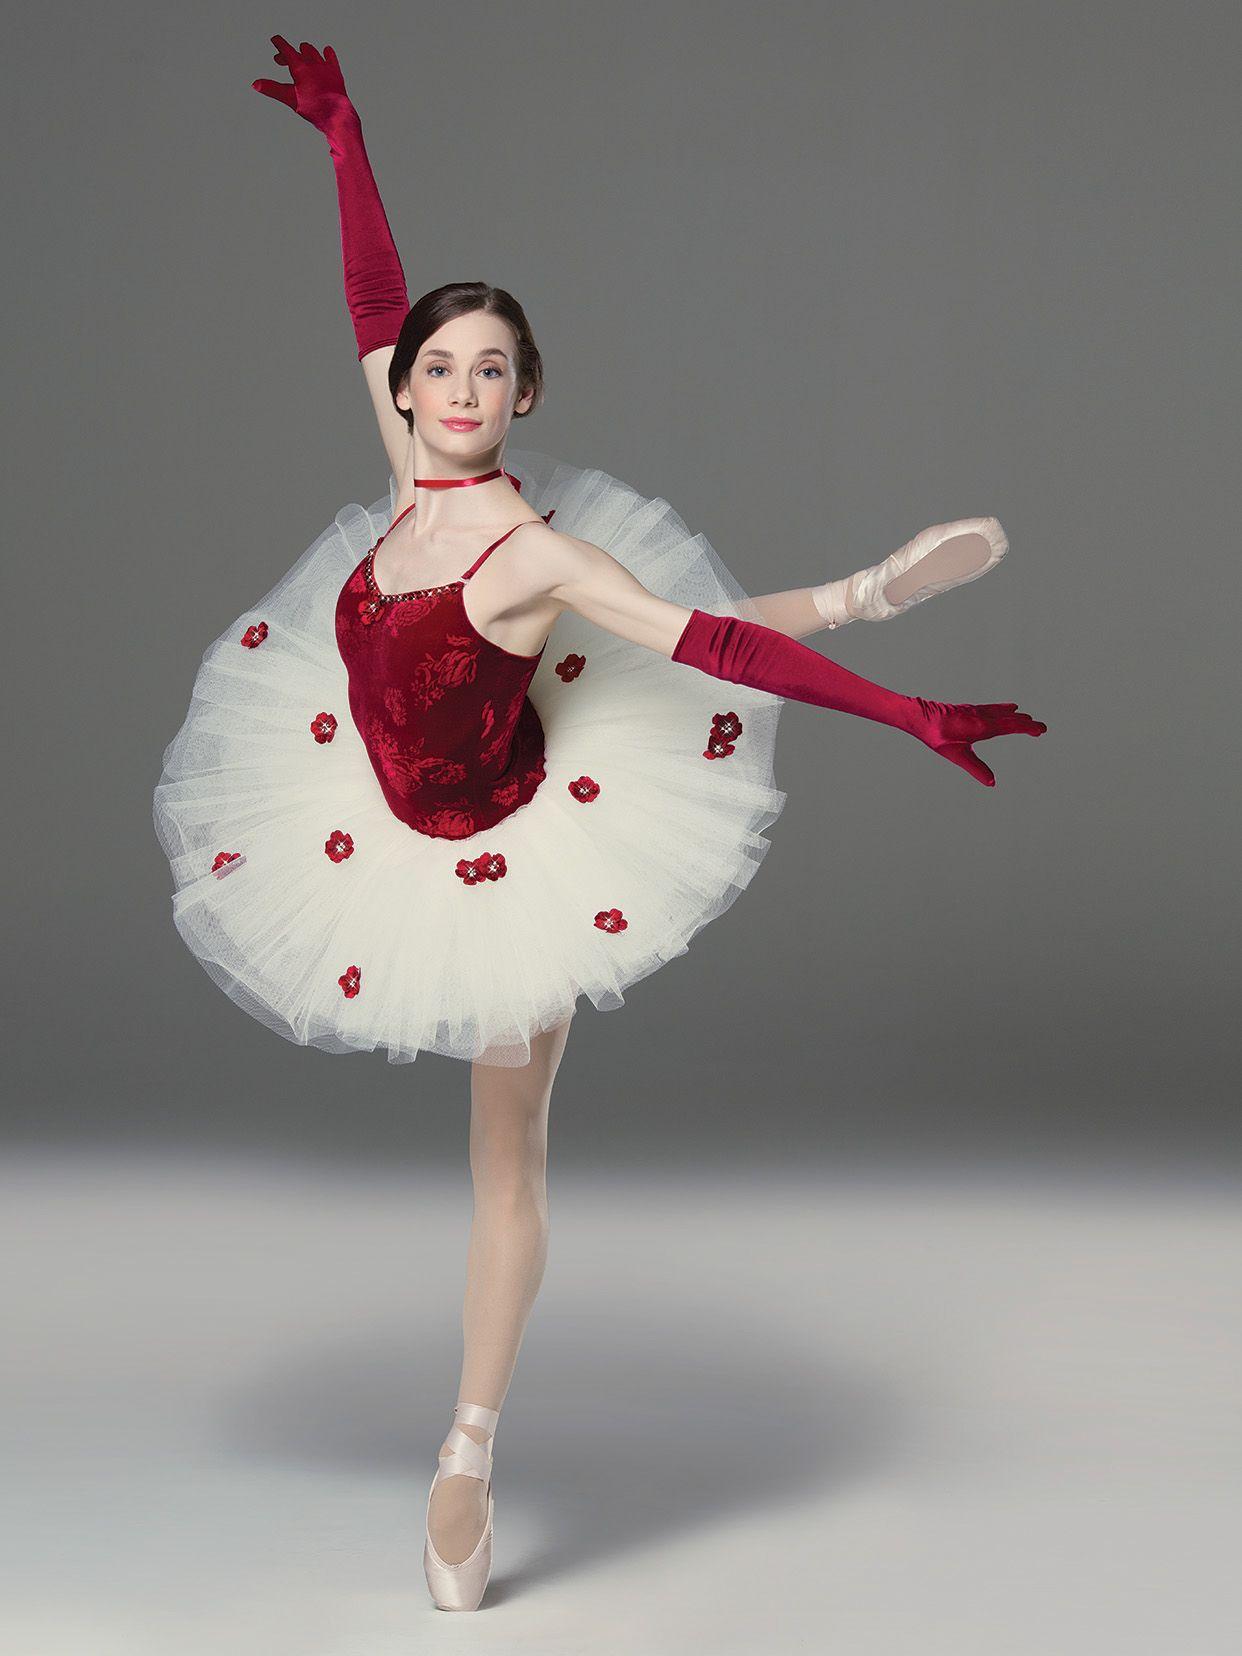 A Kiss From A Rose Revolution Dancewear Dance Attire Red